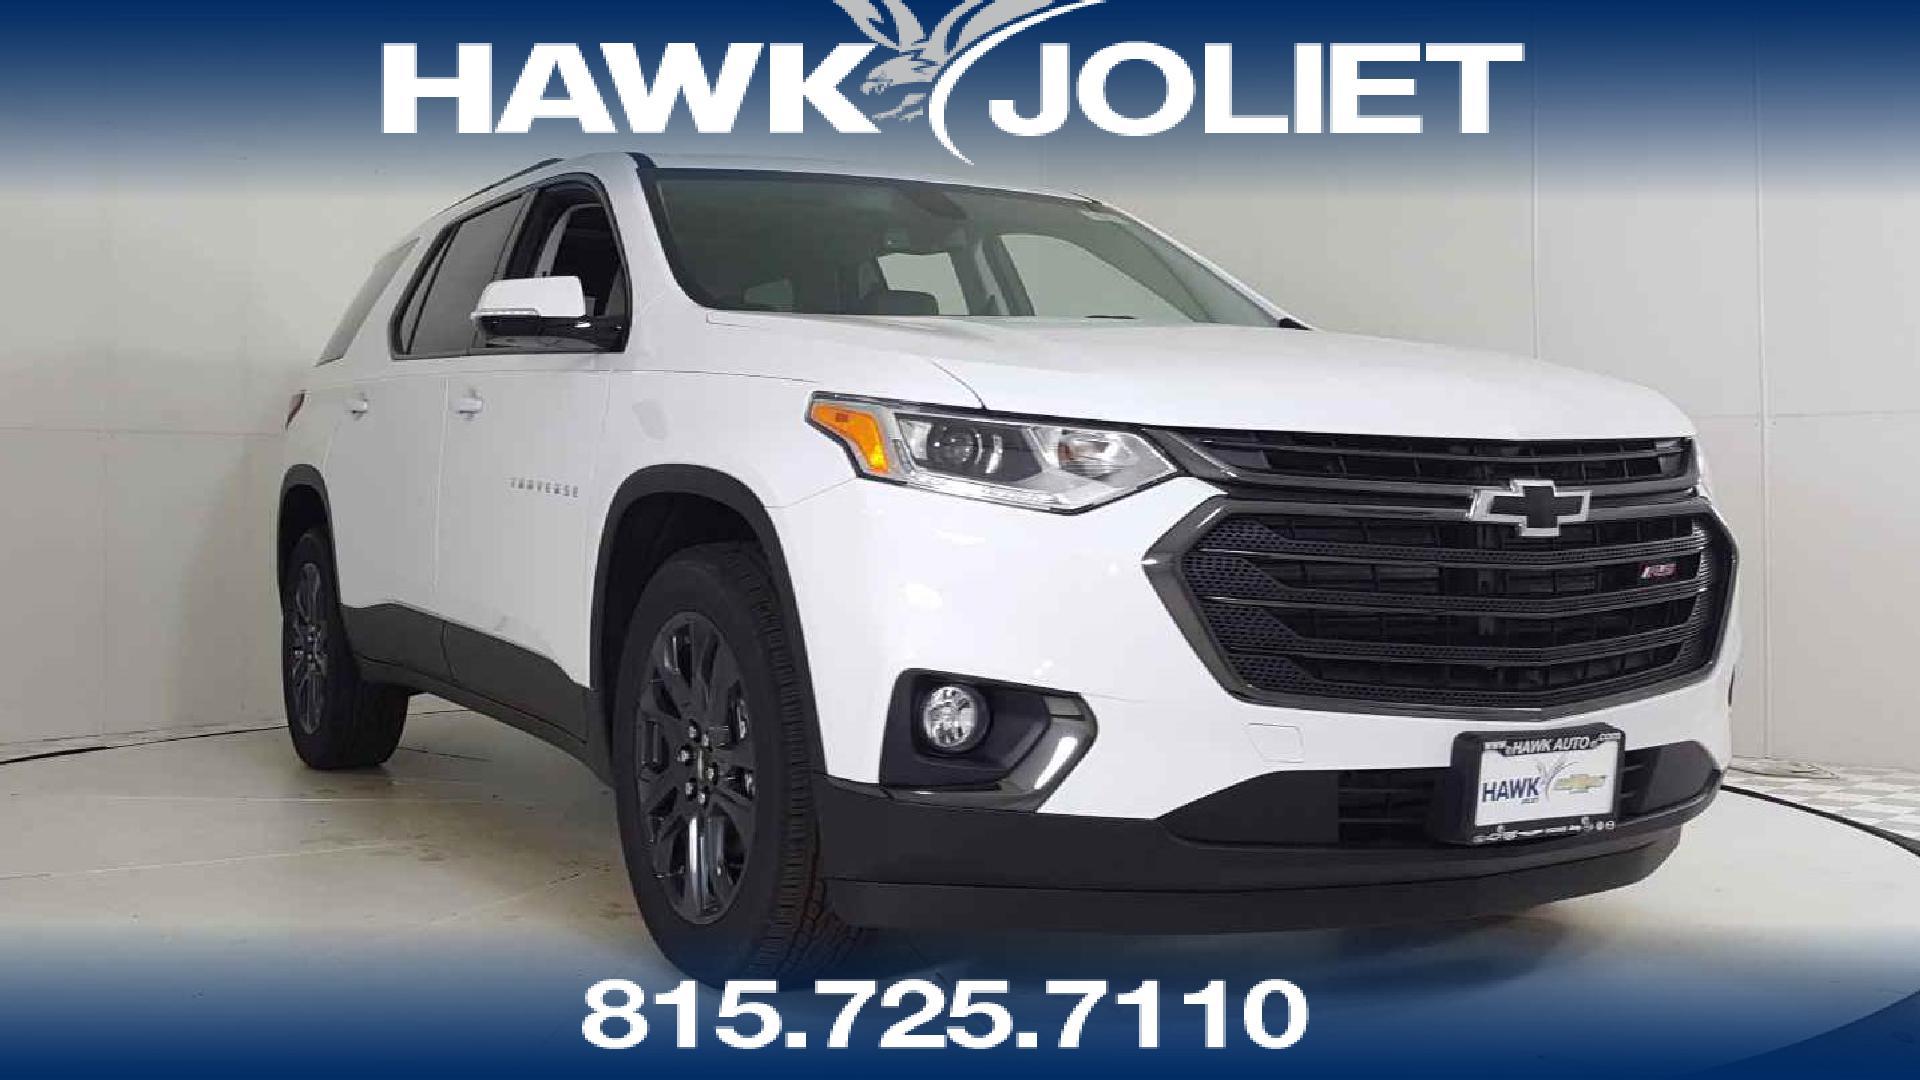 2019 Chevrolet Traverse For Sale In Joliet 1gnevjkw2kj160240 Fuel Filter 1